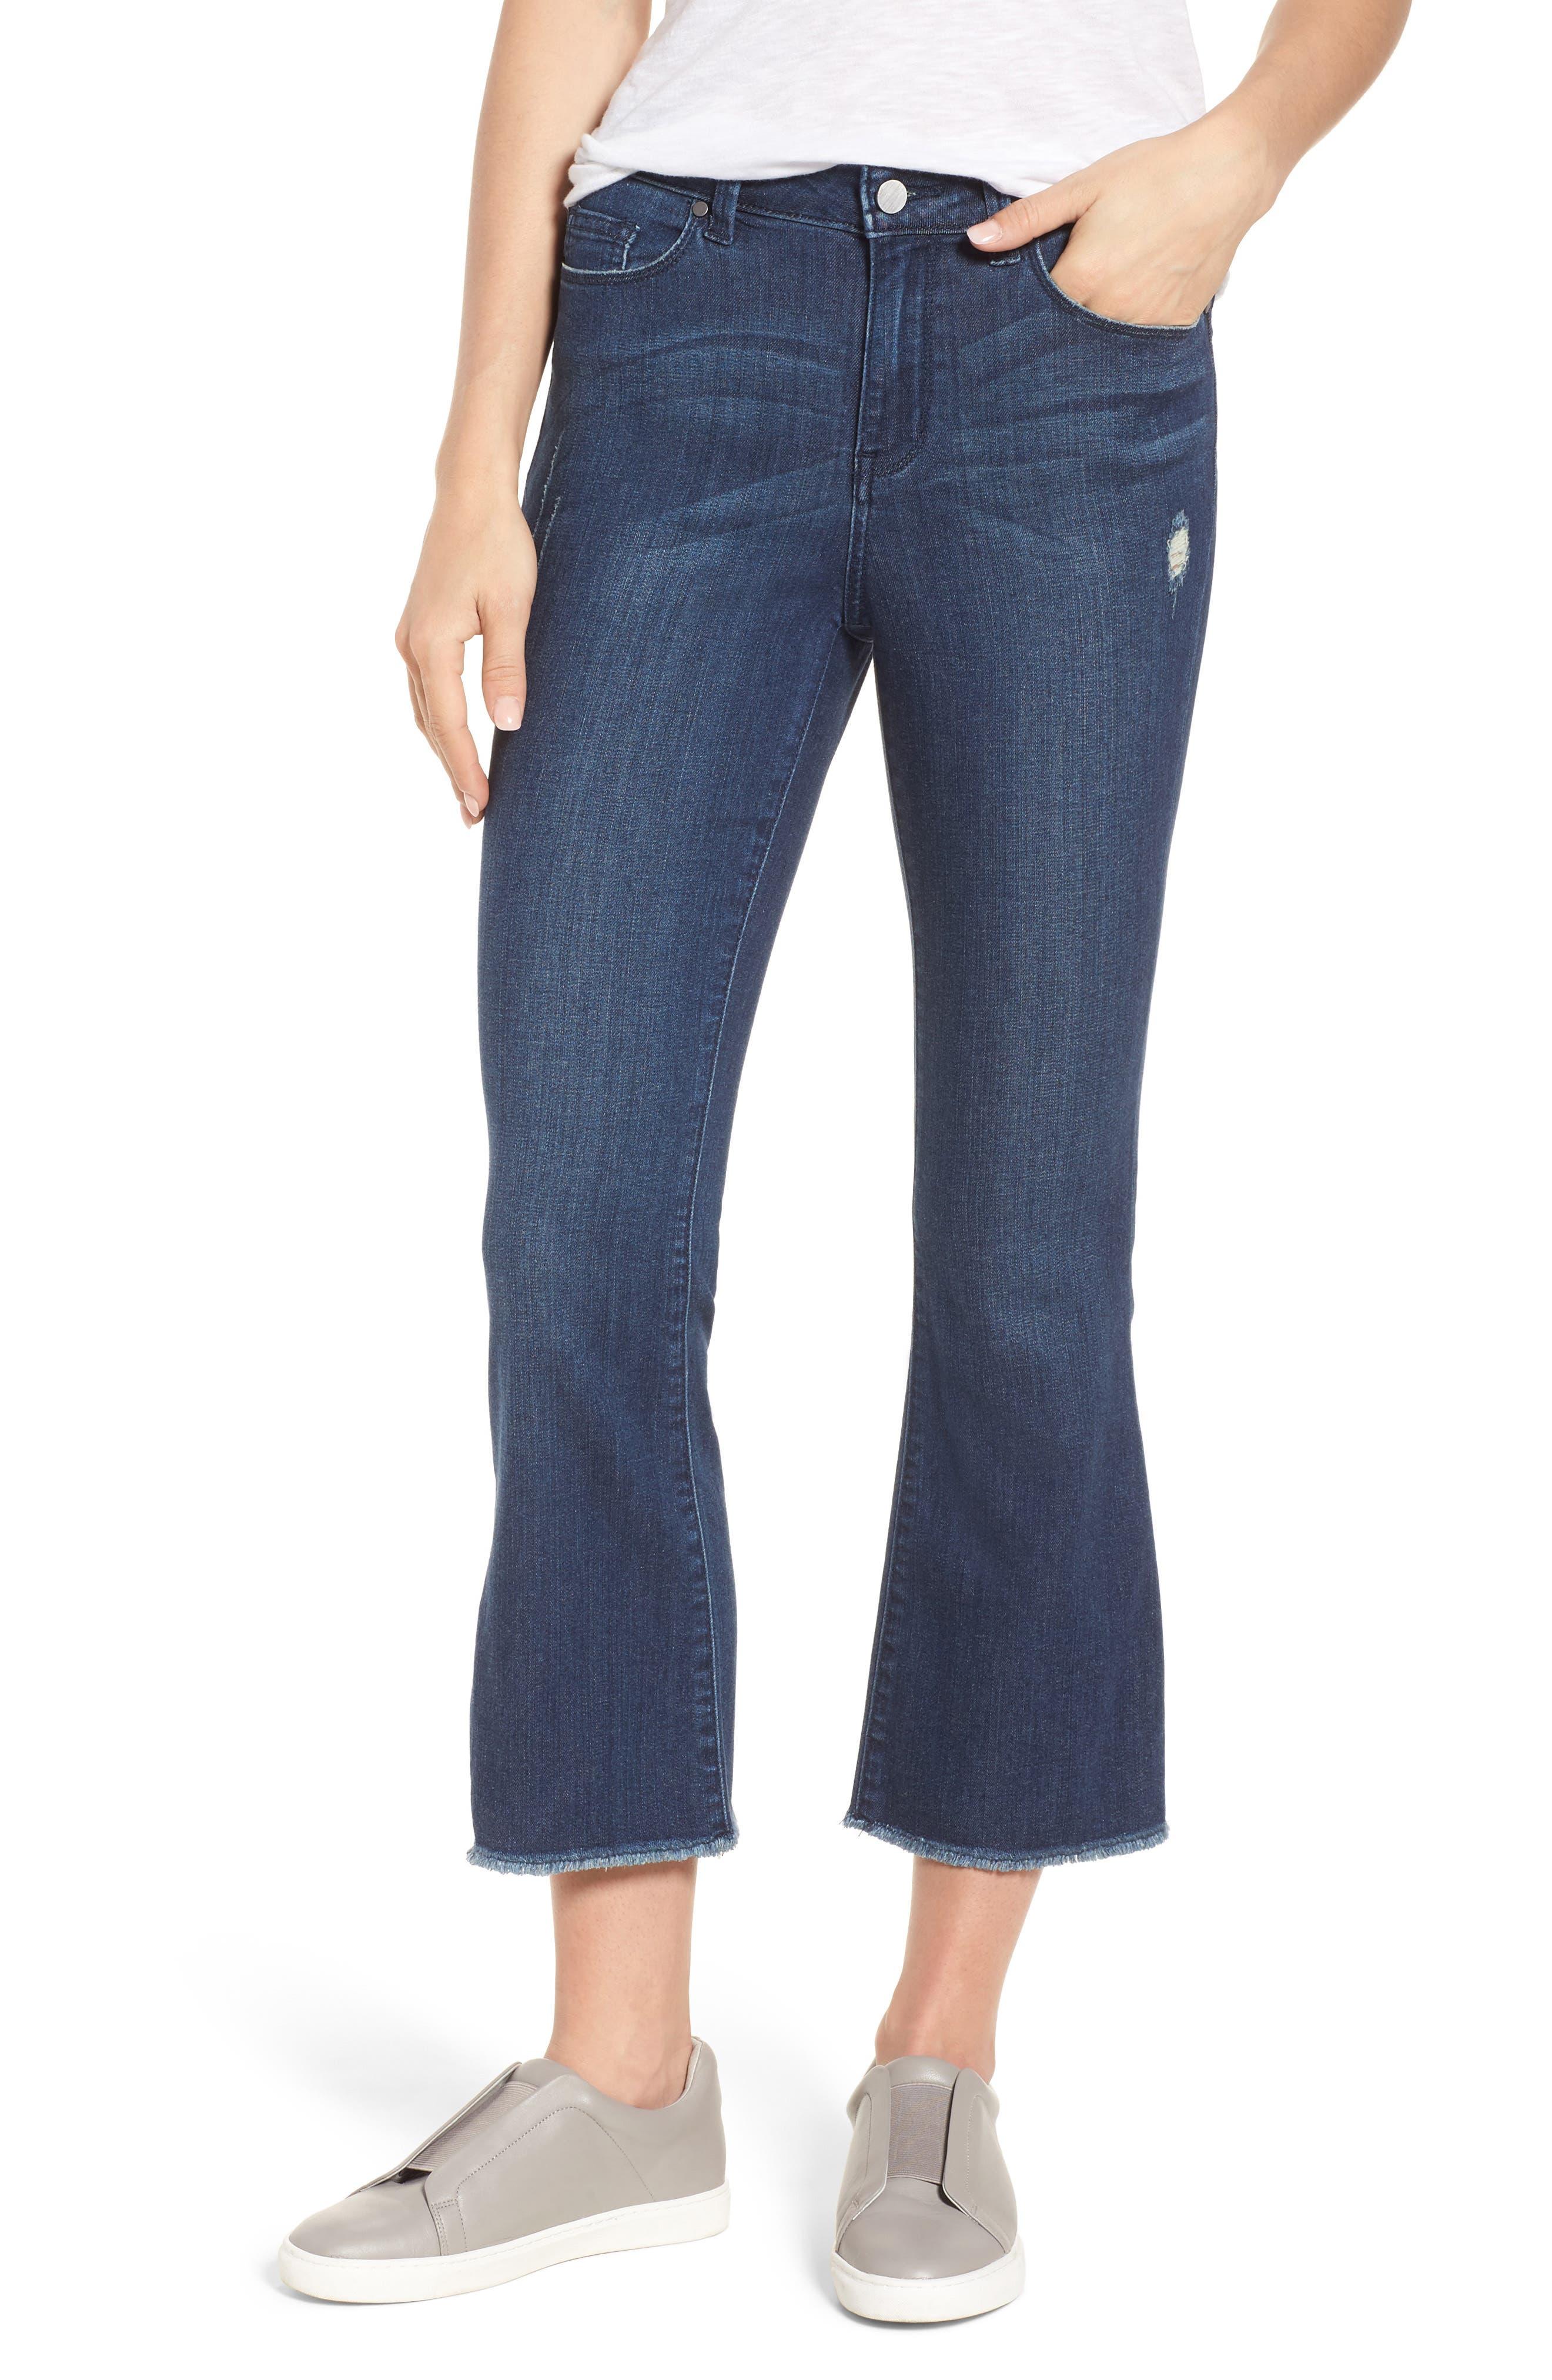 Kick Flare Jeans,                         Main,                         color, Stardust Wash